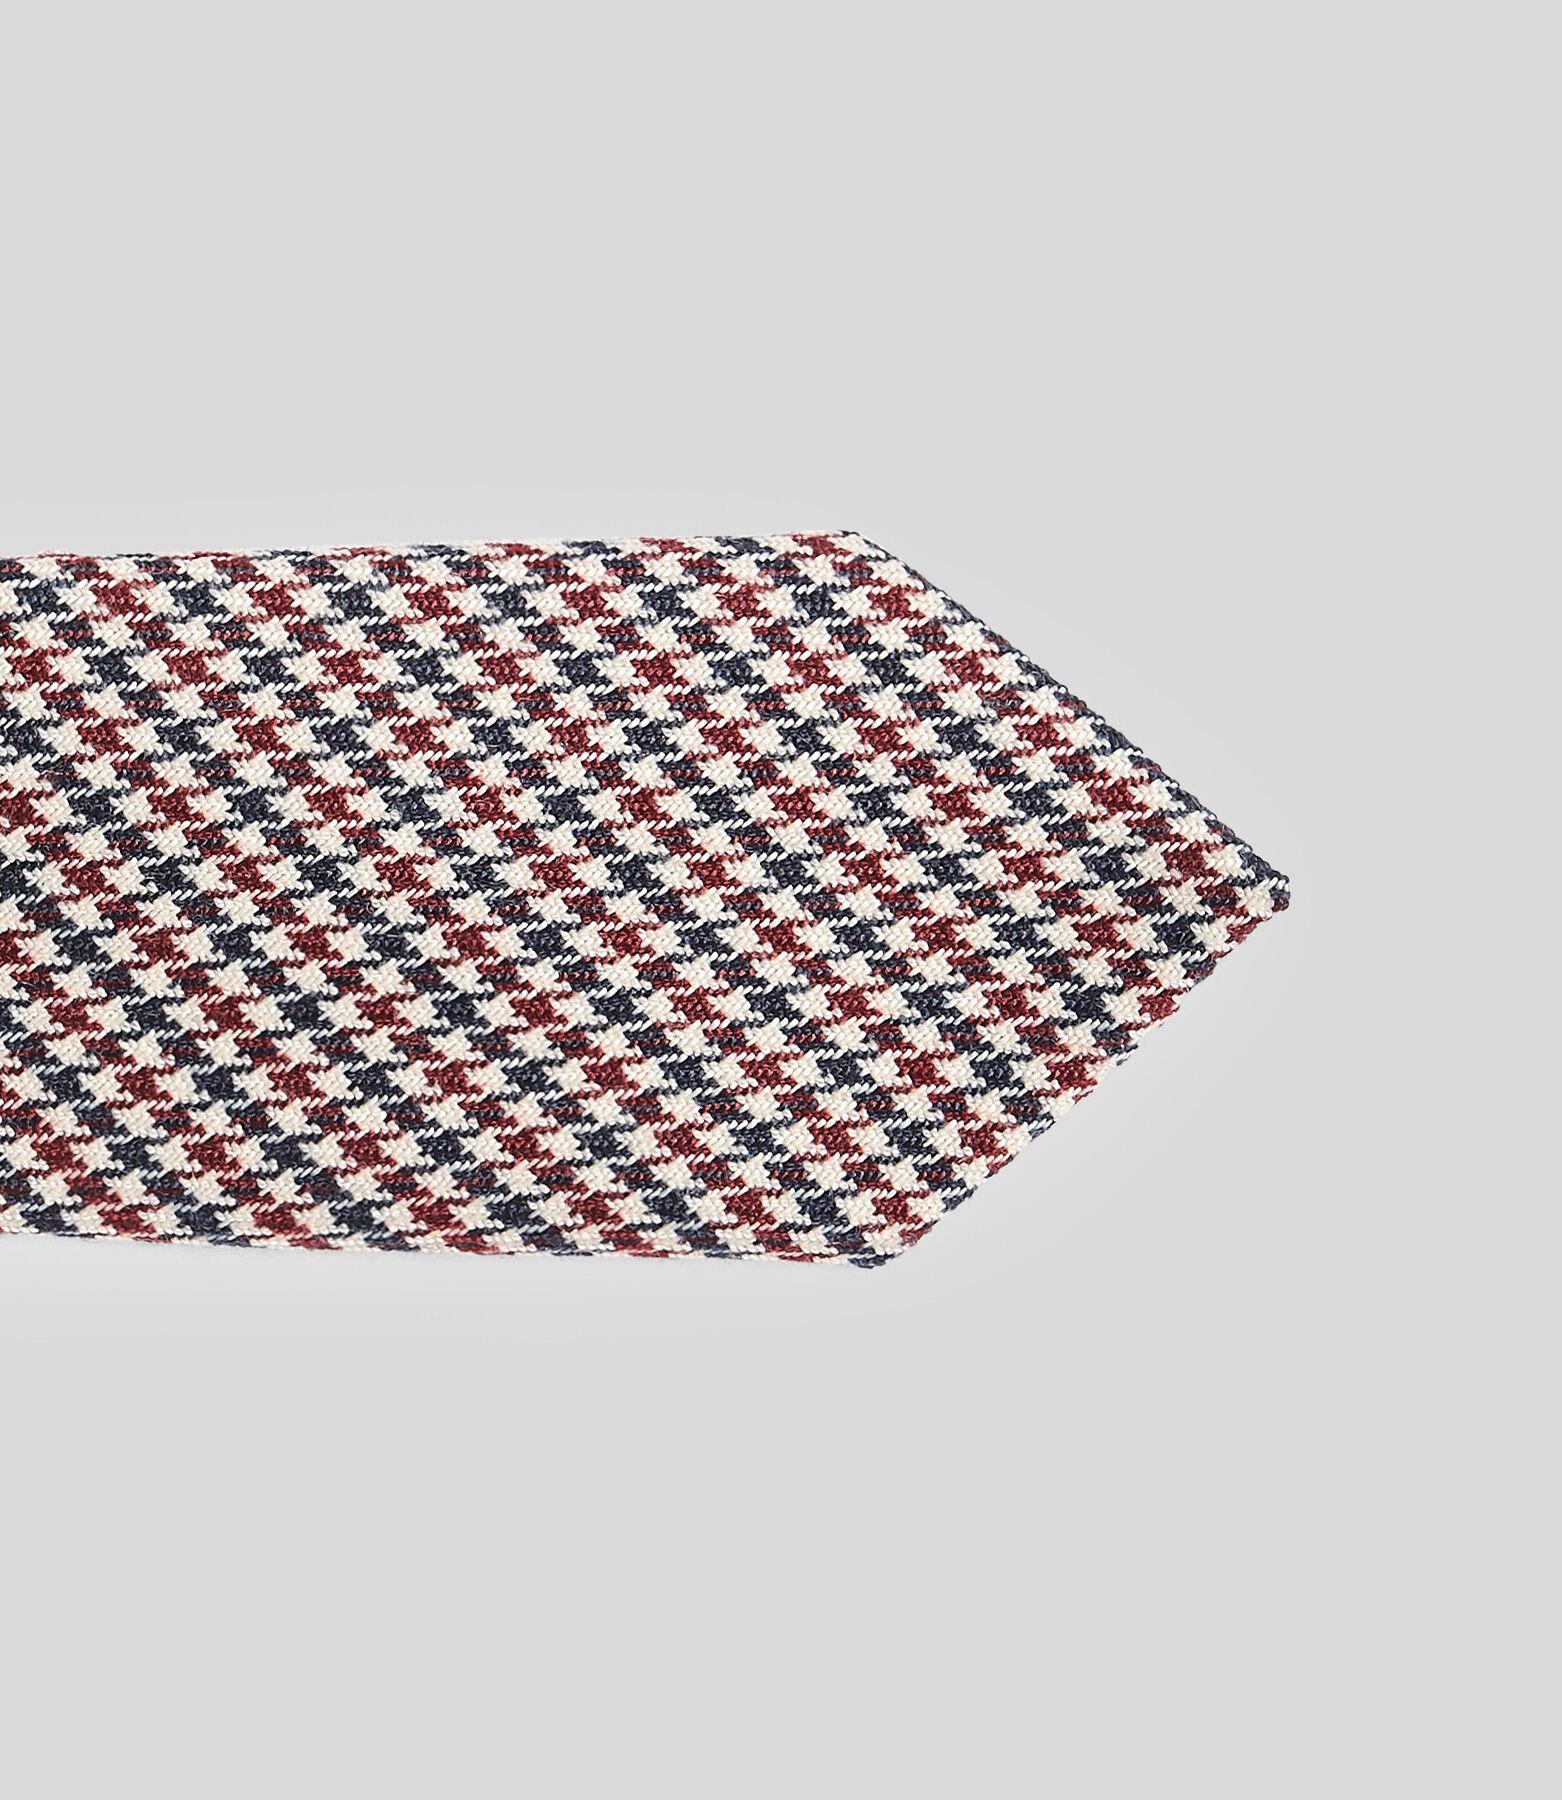 Cravate slim motif pied de puce